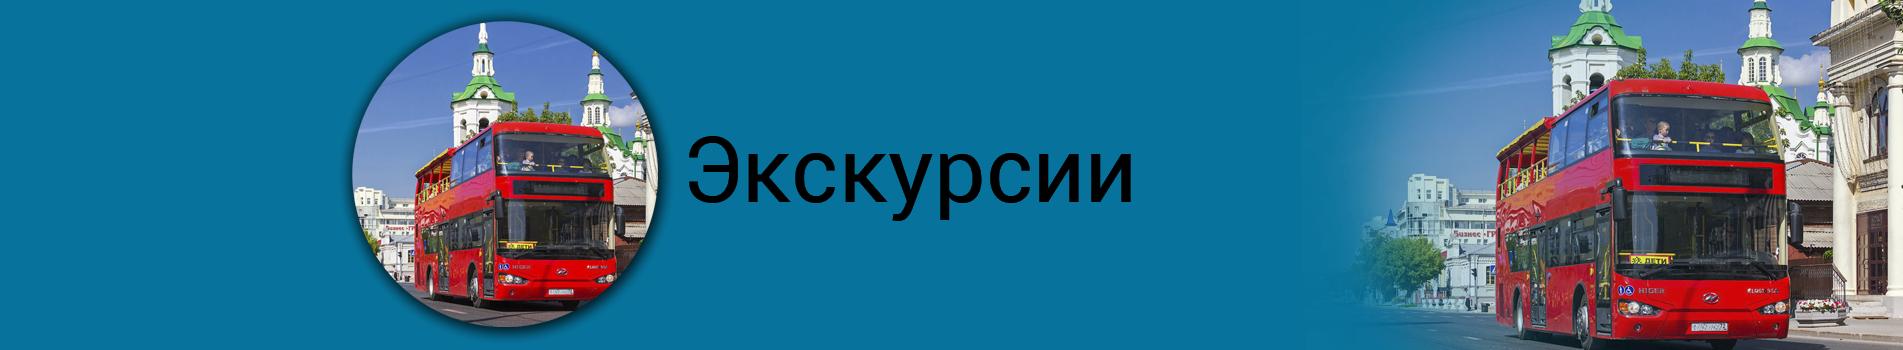 ekskursii_1